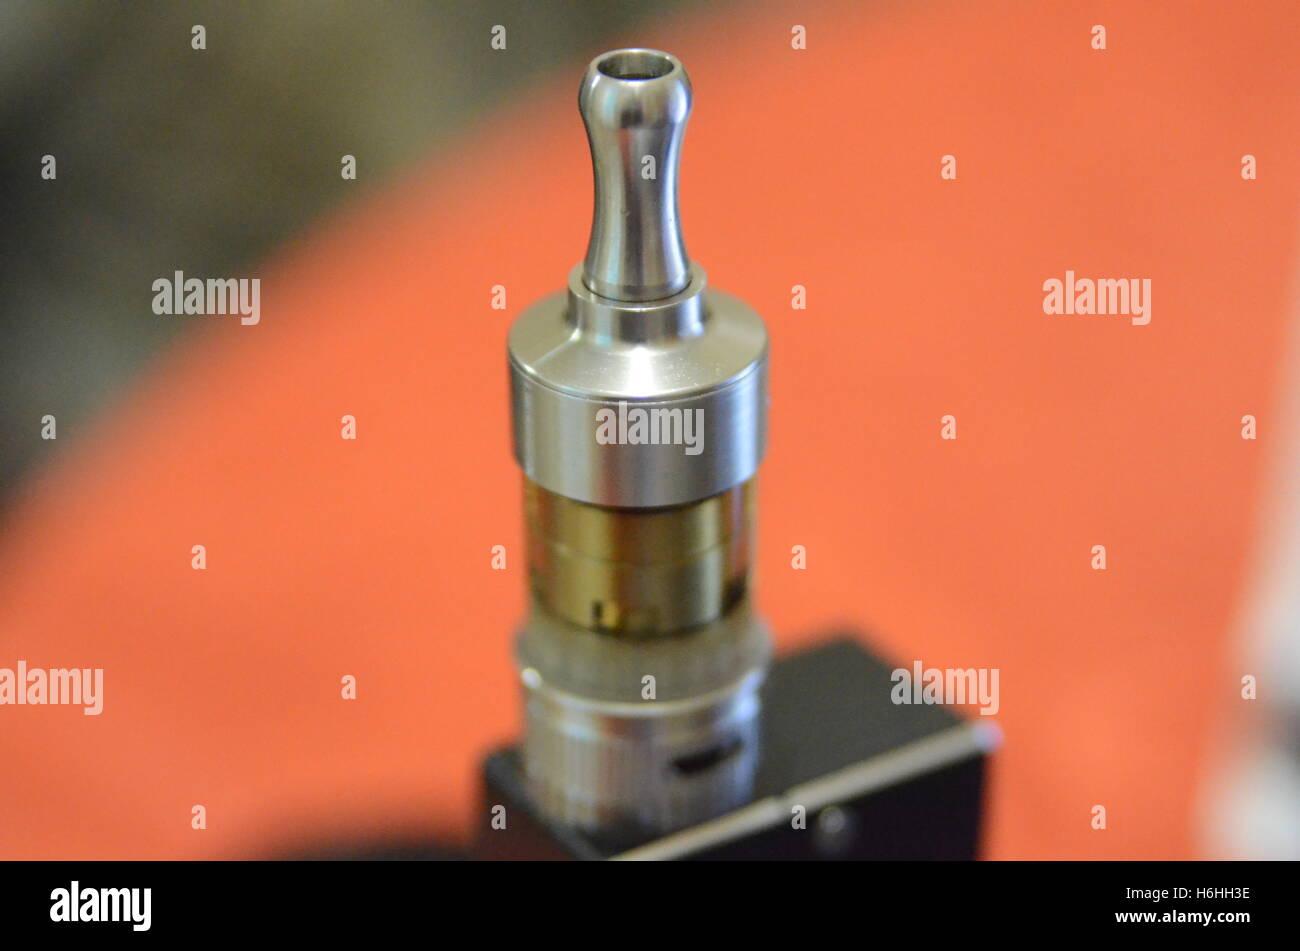 E-cig Vape mod and tank - Stock Image